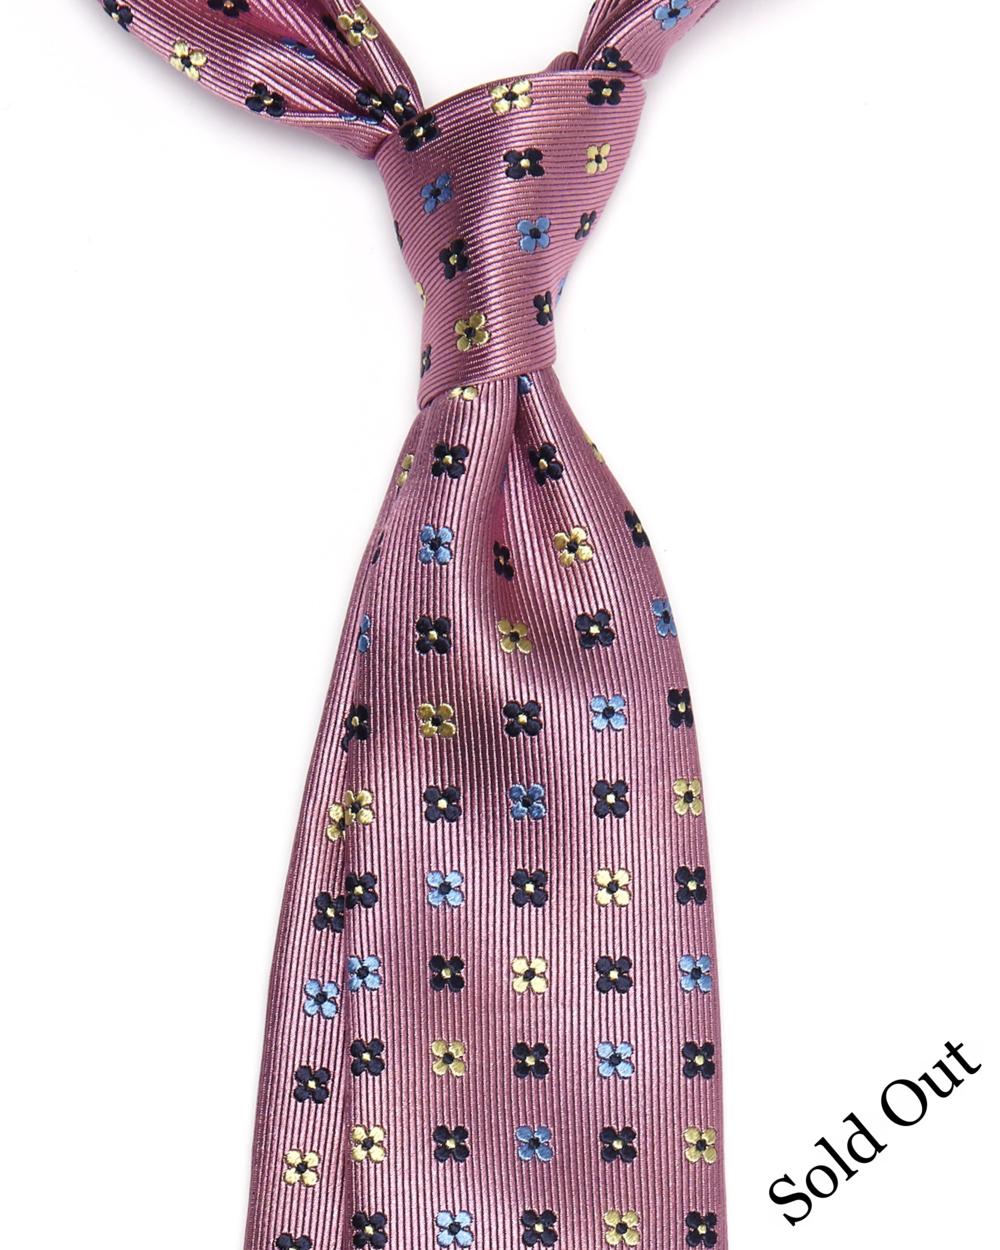 Alastair Tie |Silk Floral Pattern | 4 ExclusiveHandMade Ties Available- £98.00